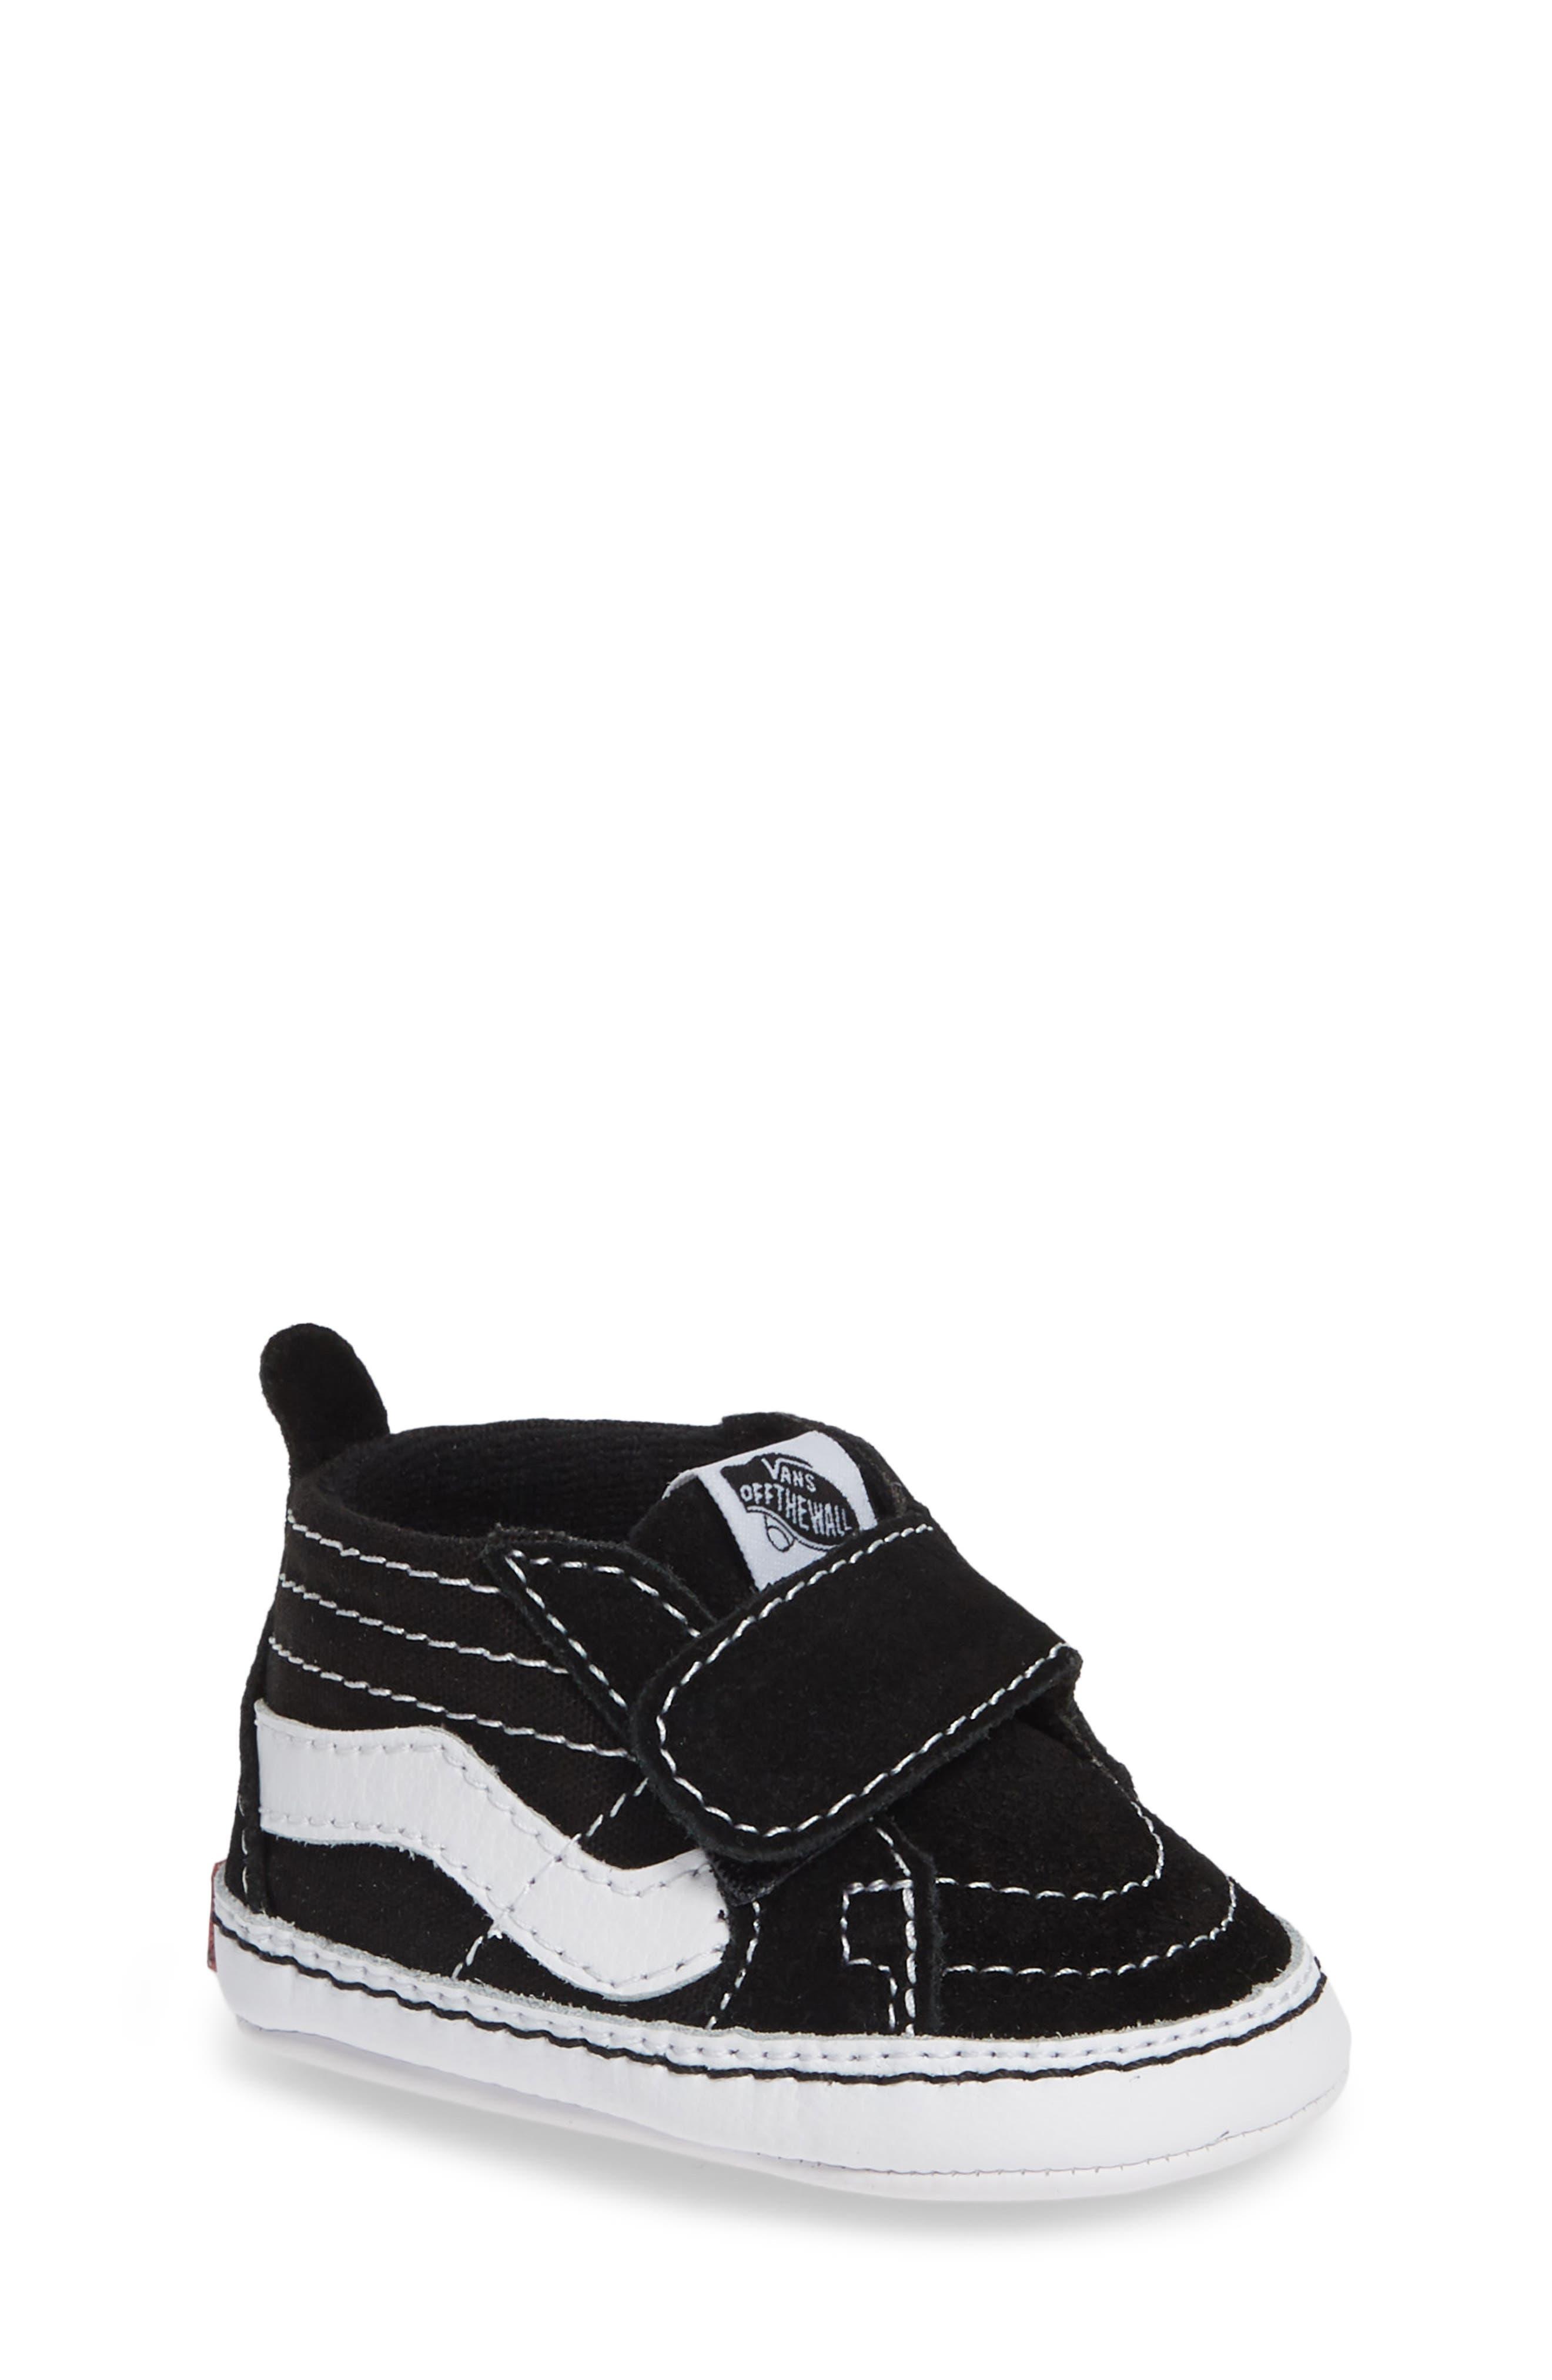 VANS, 'SK8-Hi' Crib Sneaker, Main thumbnail 1, color, BLACK/TRUE WHITE